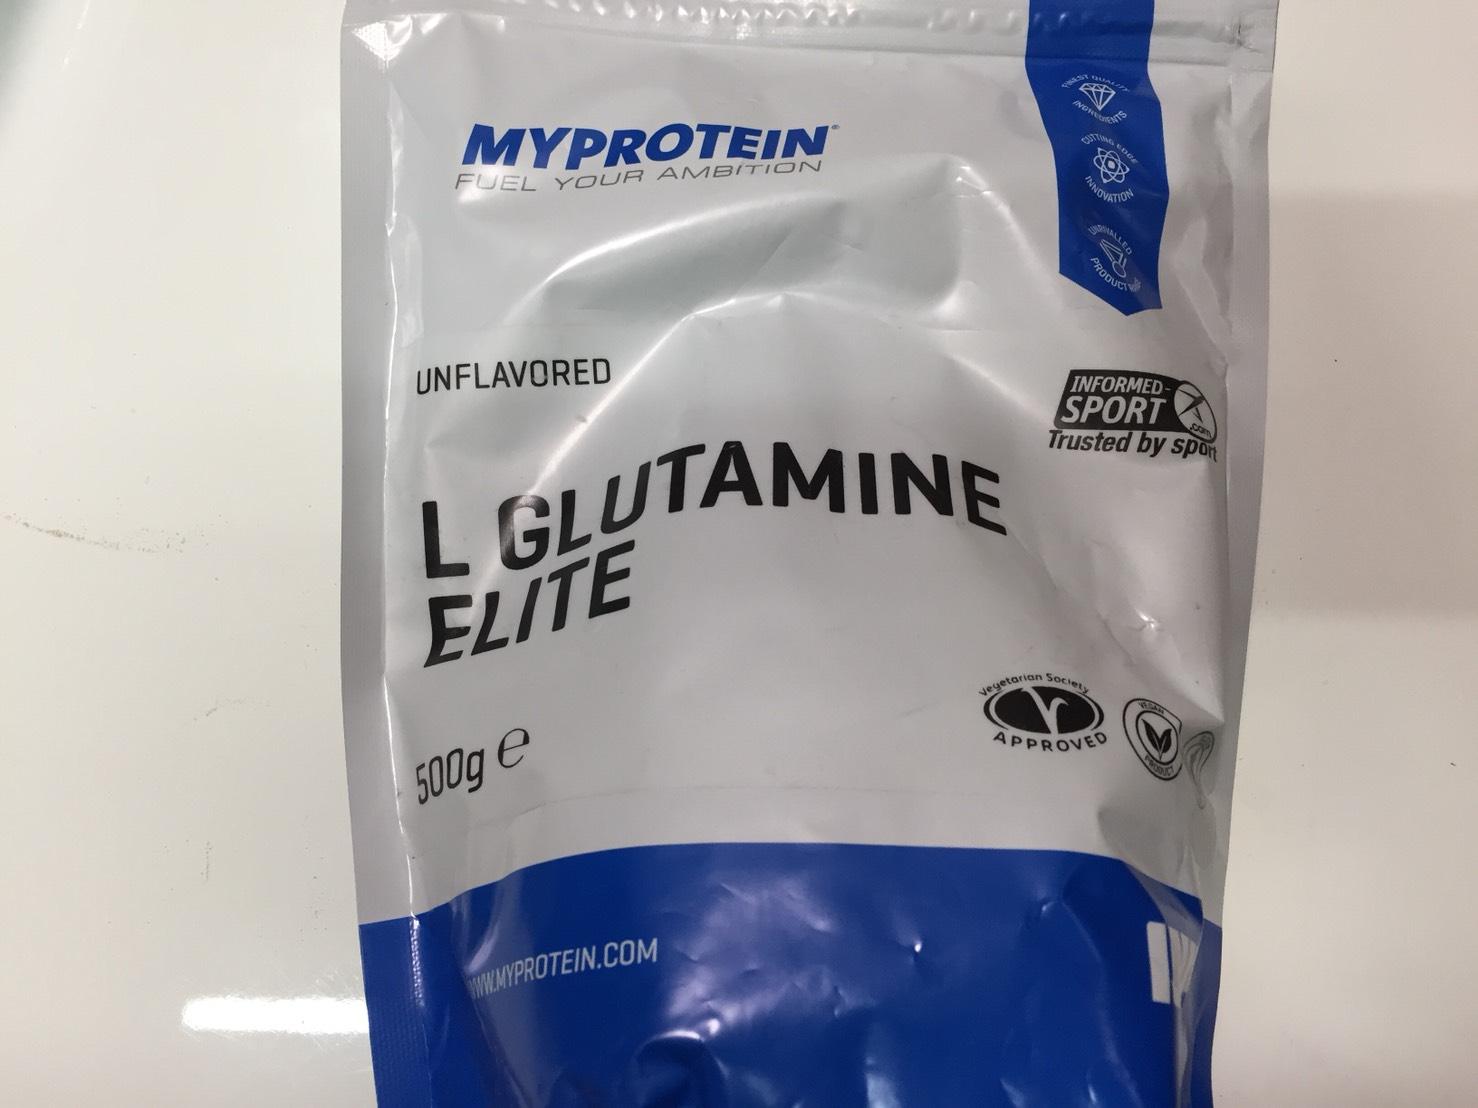 L-GLUTAMINE ELITE(グルタミンエリート)